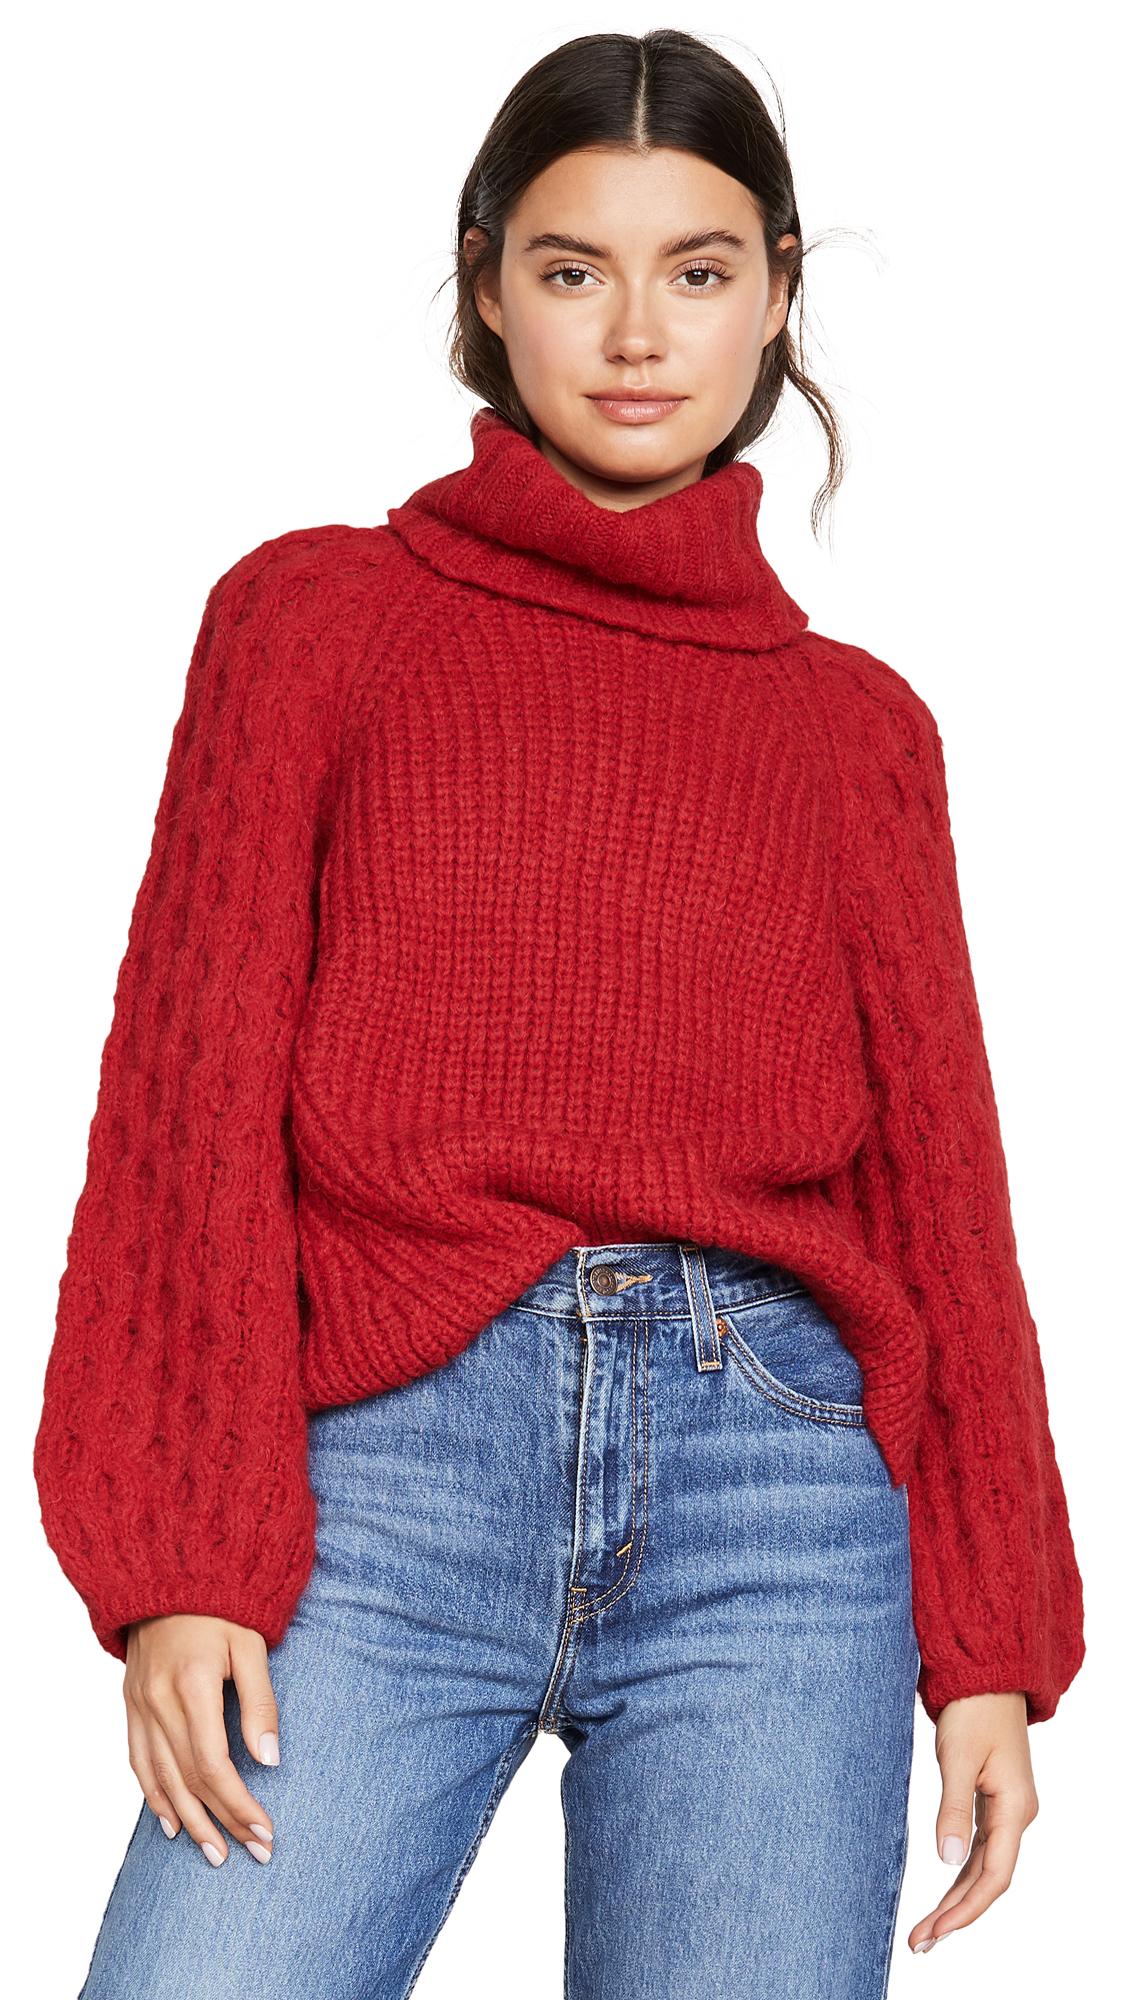 Eleven Six Nina Alpaca Sweater In Red